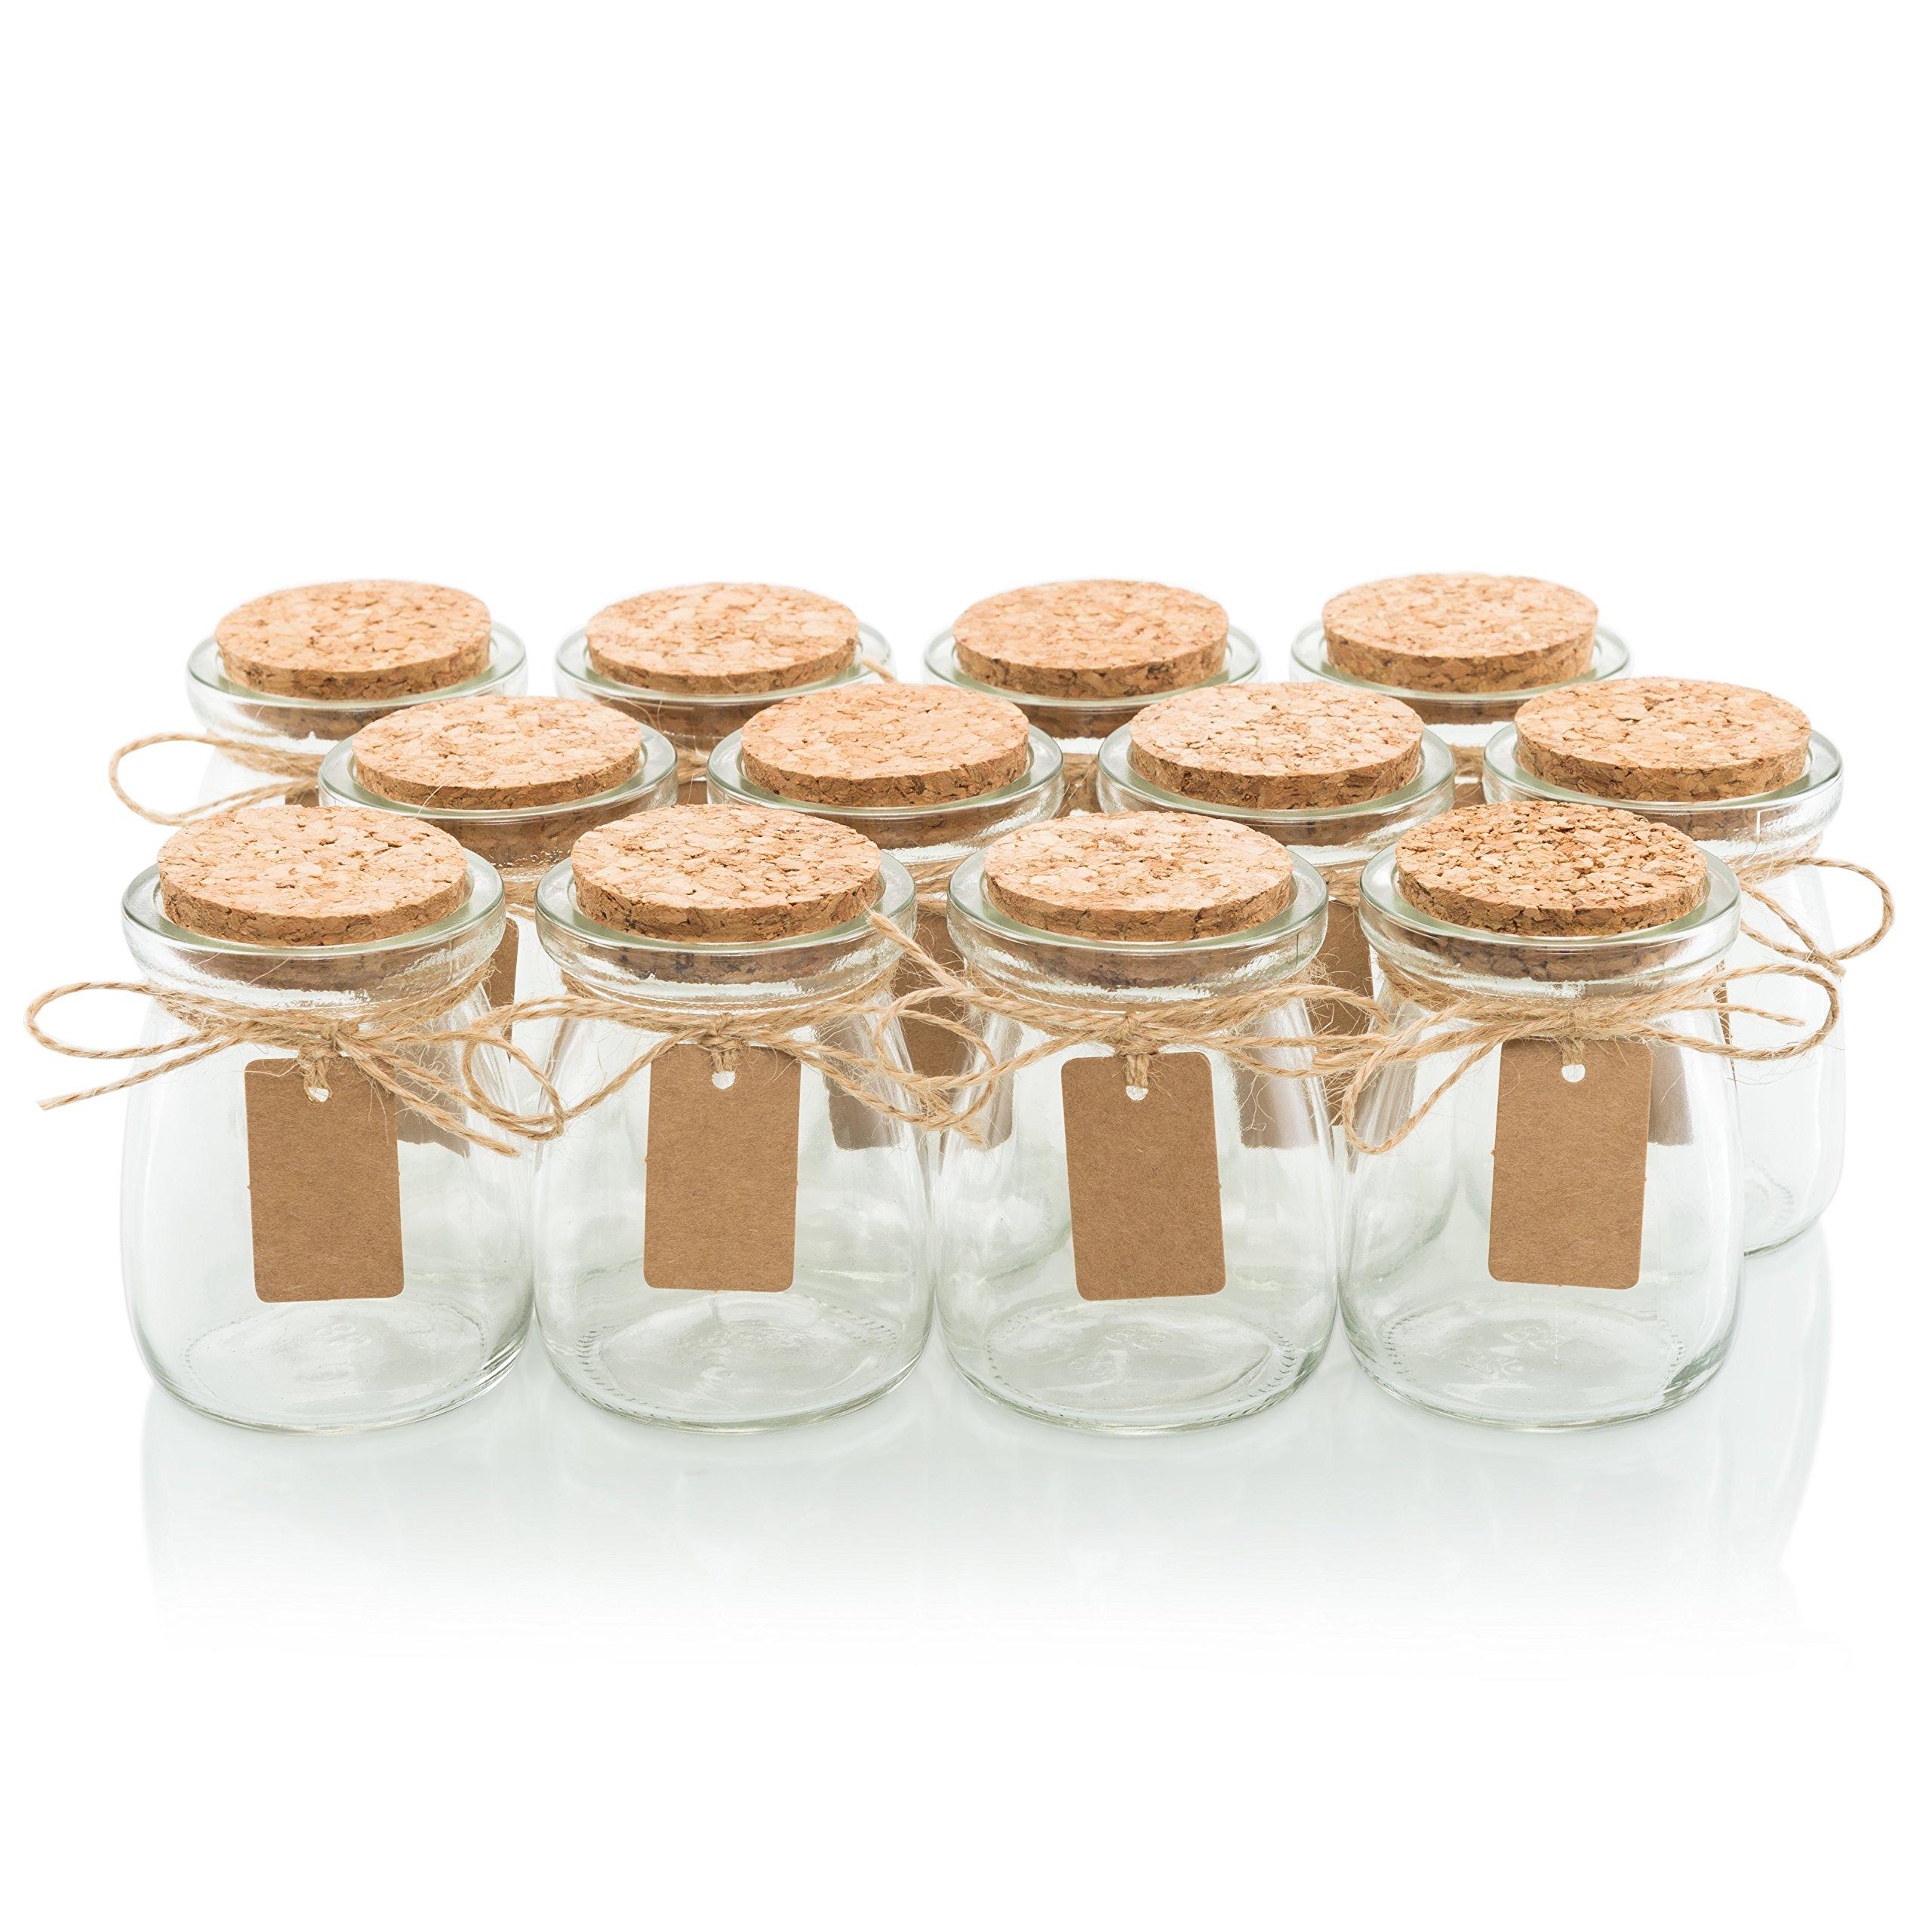 kate aspen square glass favor jar with cork stopper petite treat 12 count. Black Bedroom Furniture Sets. Home Design Ideas